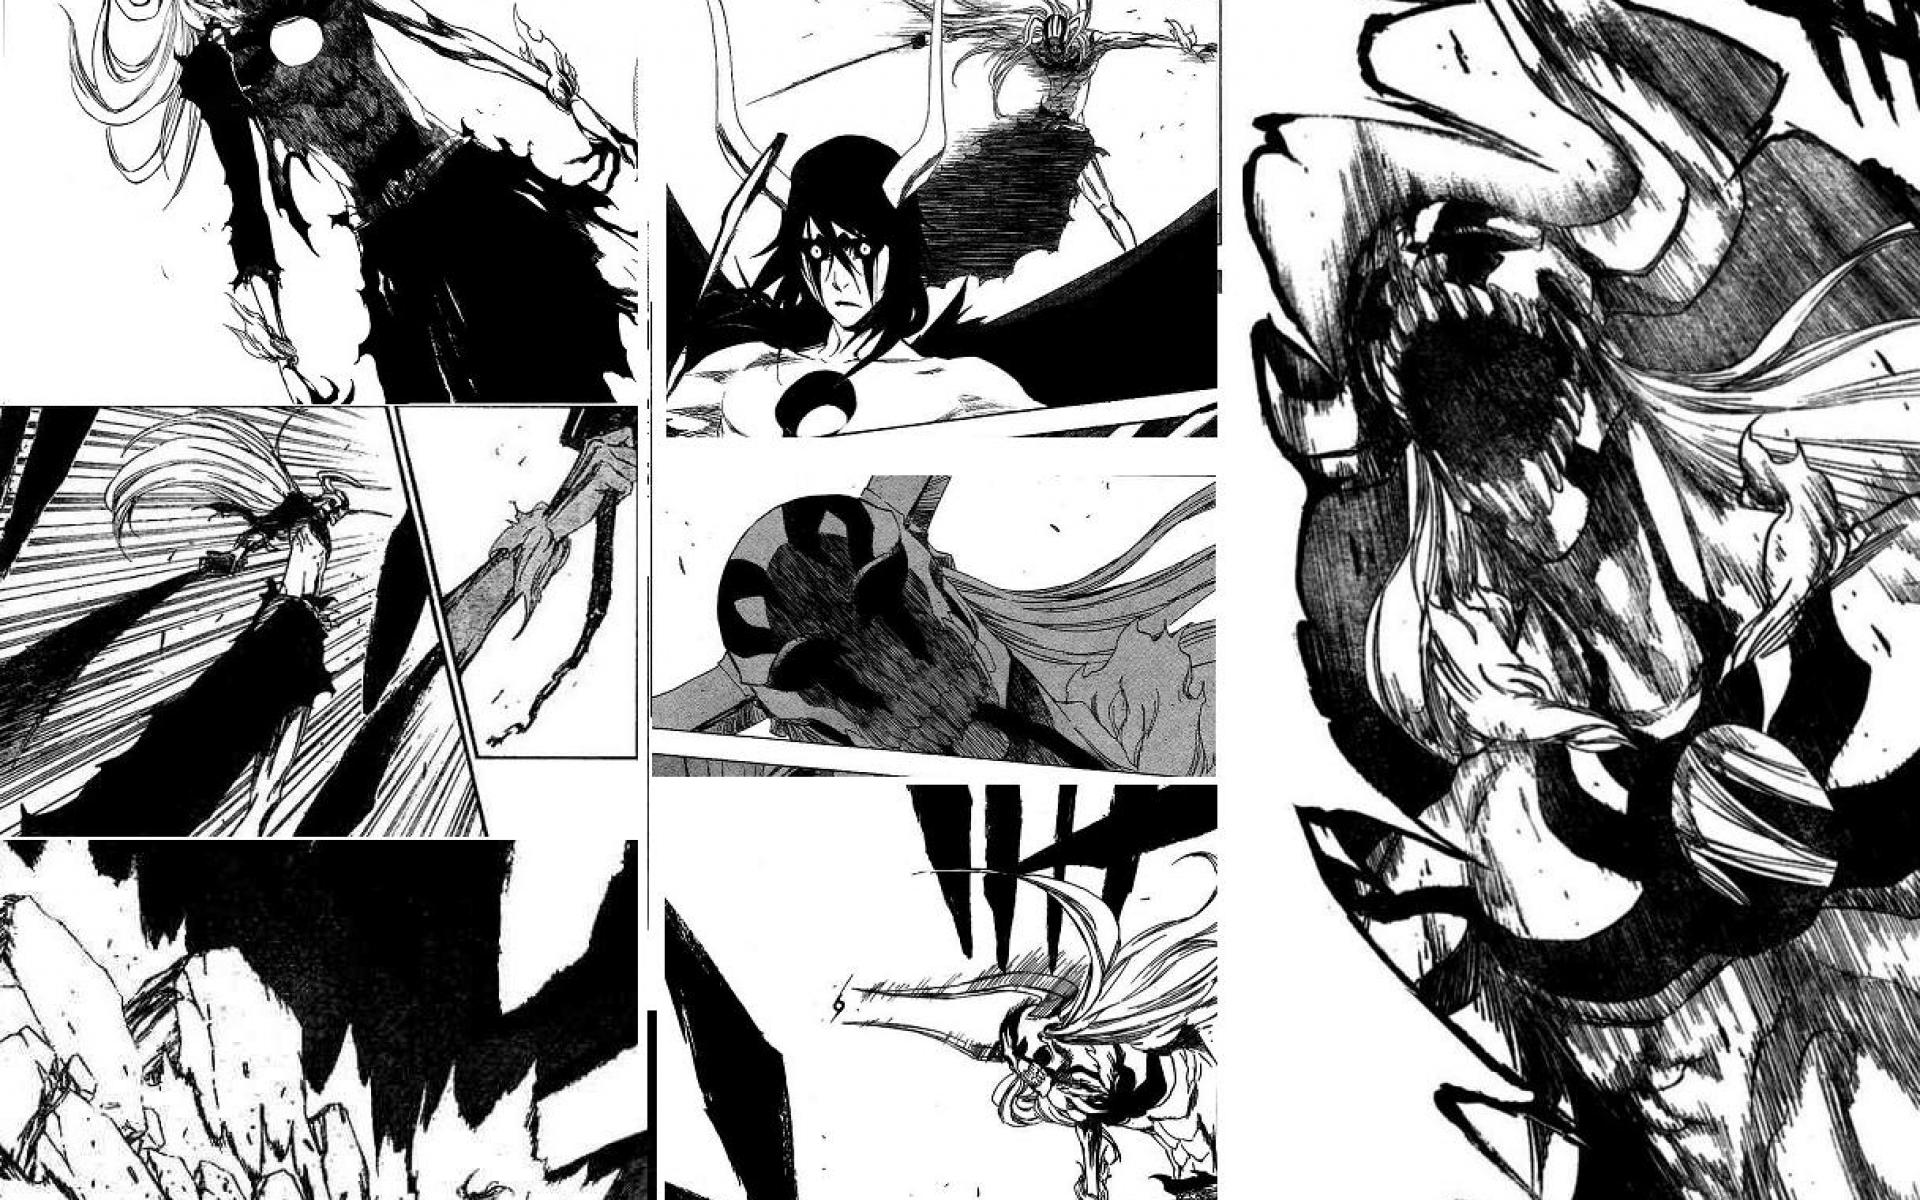 bleach manga wallpapers group (86+)